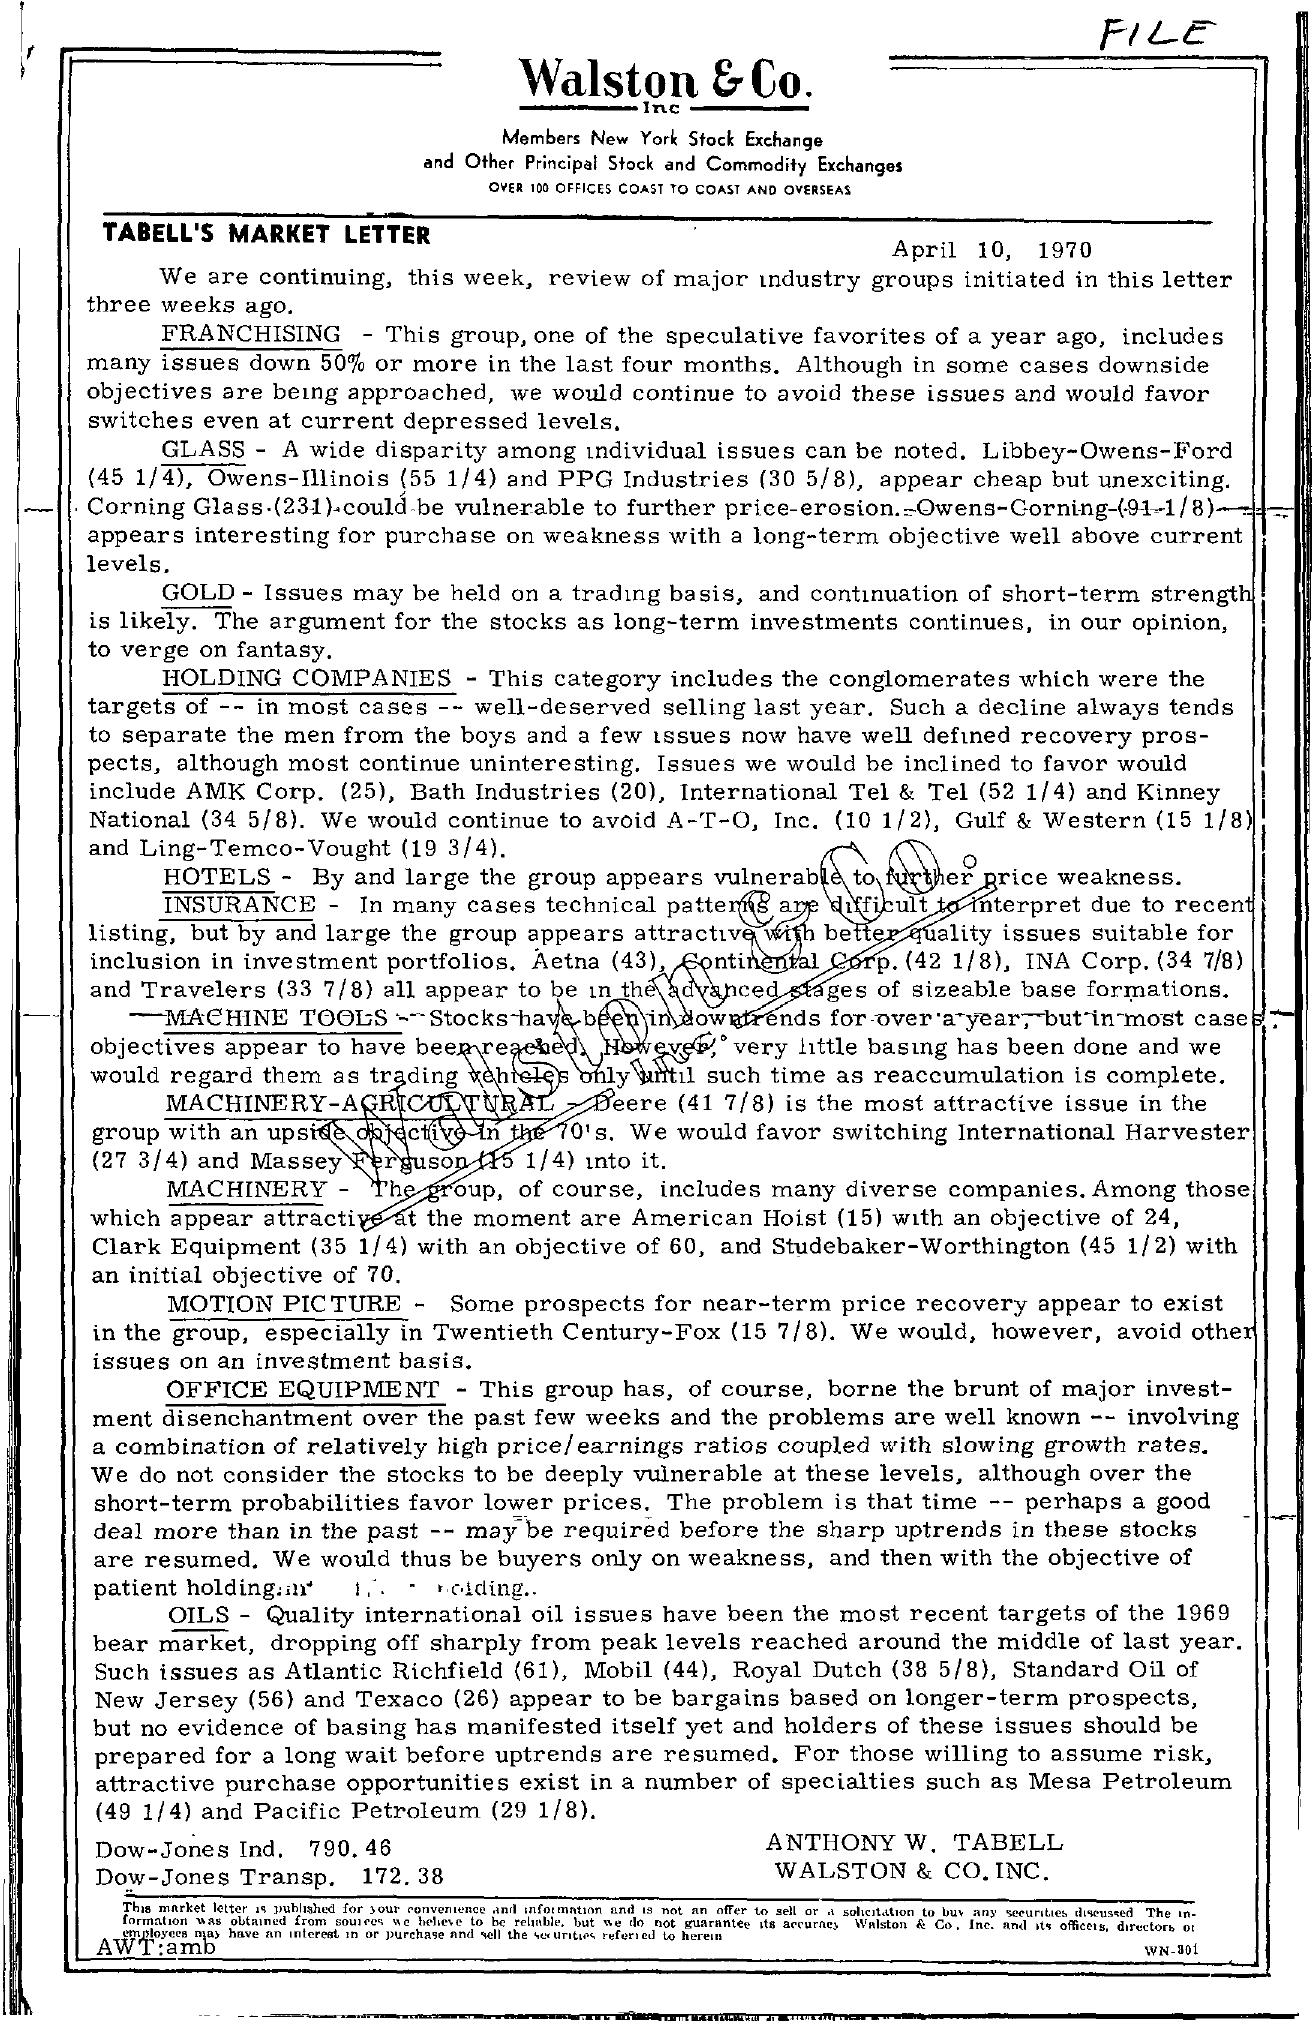 Tabell's Market Letter - April 10, 1970